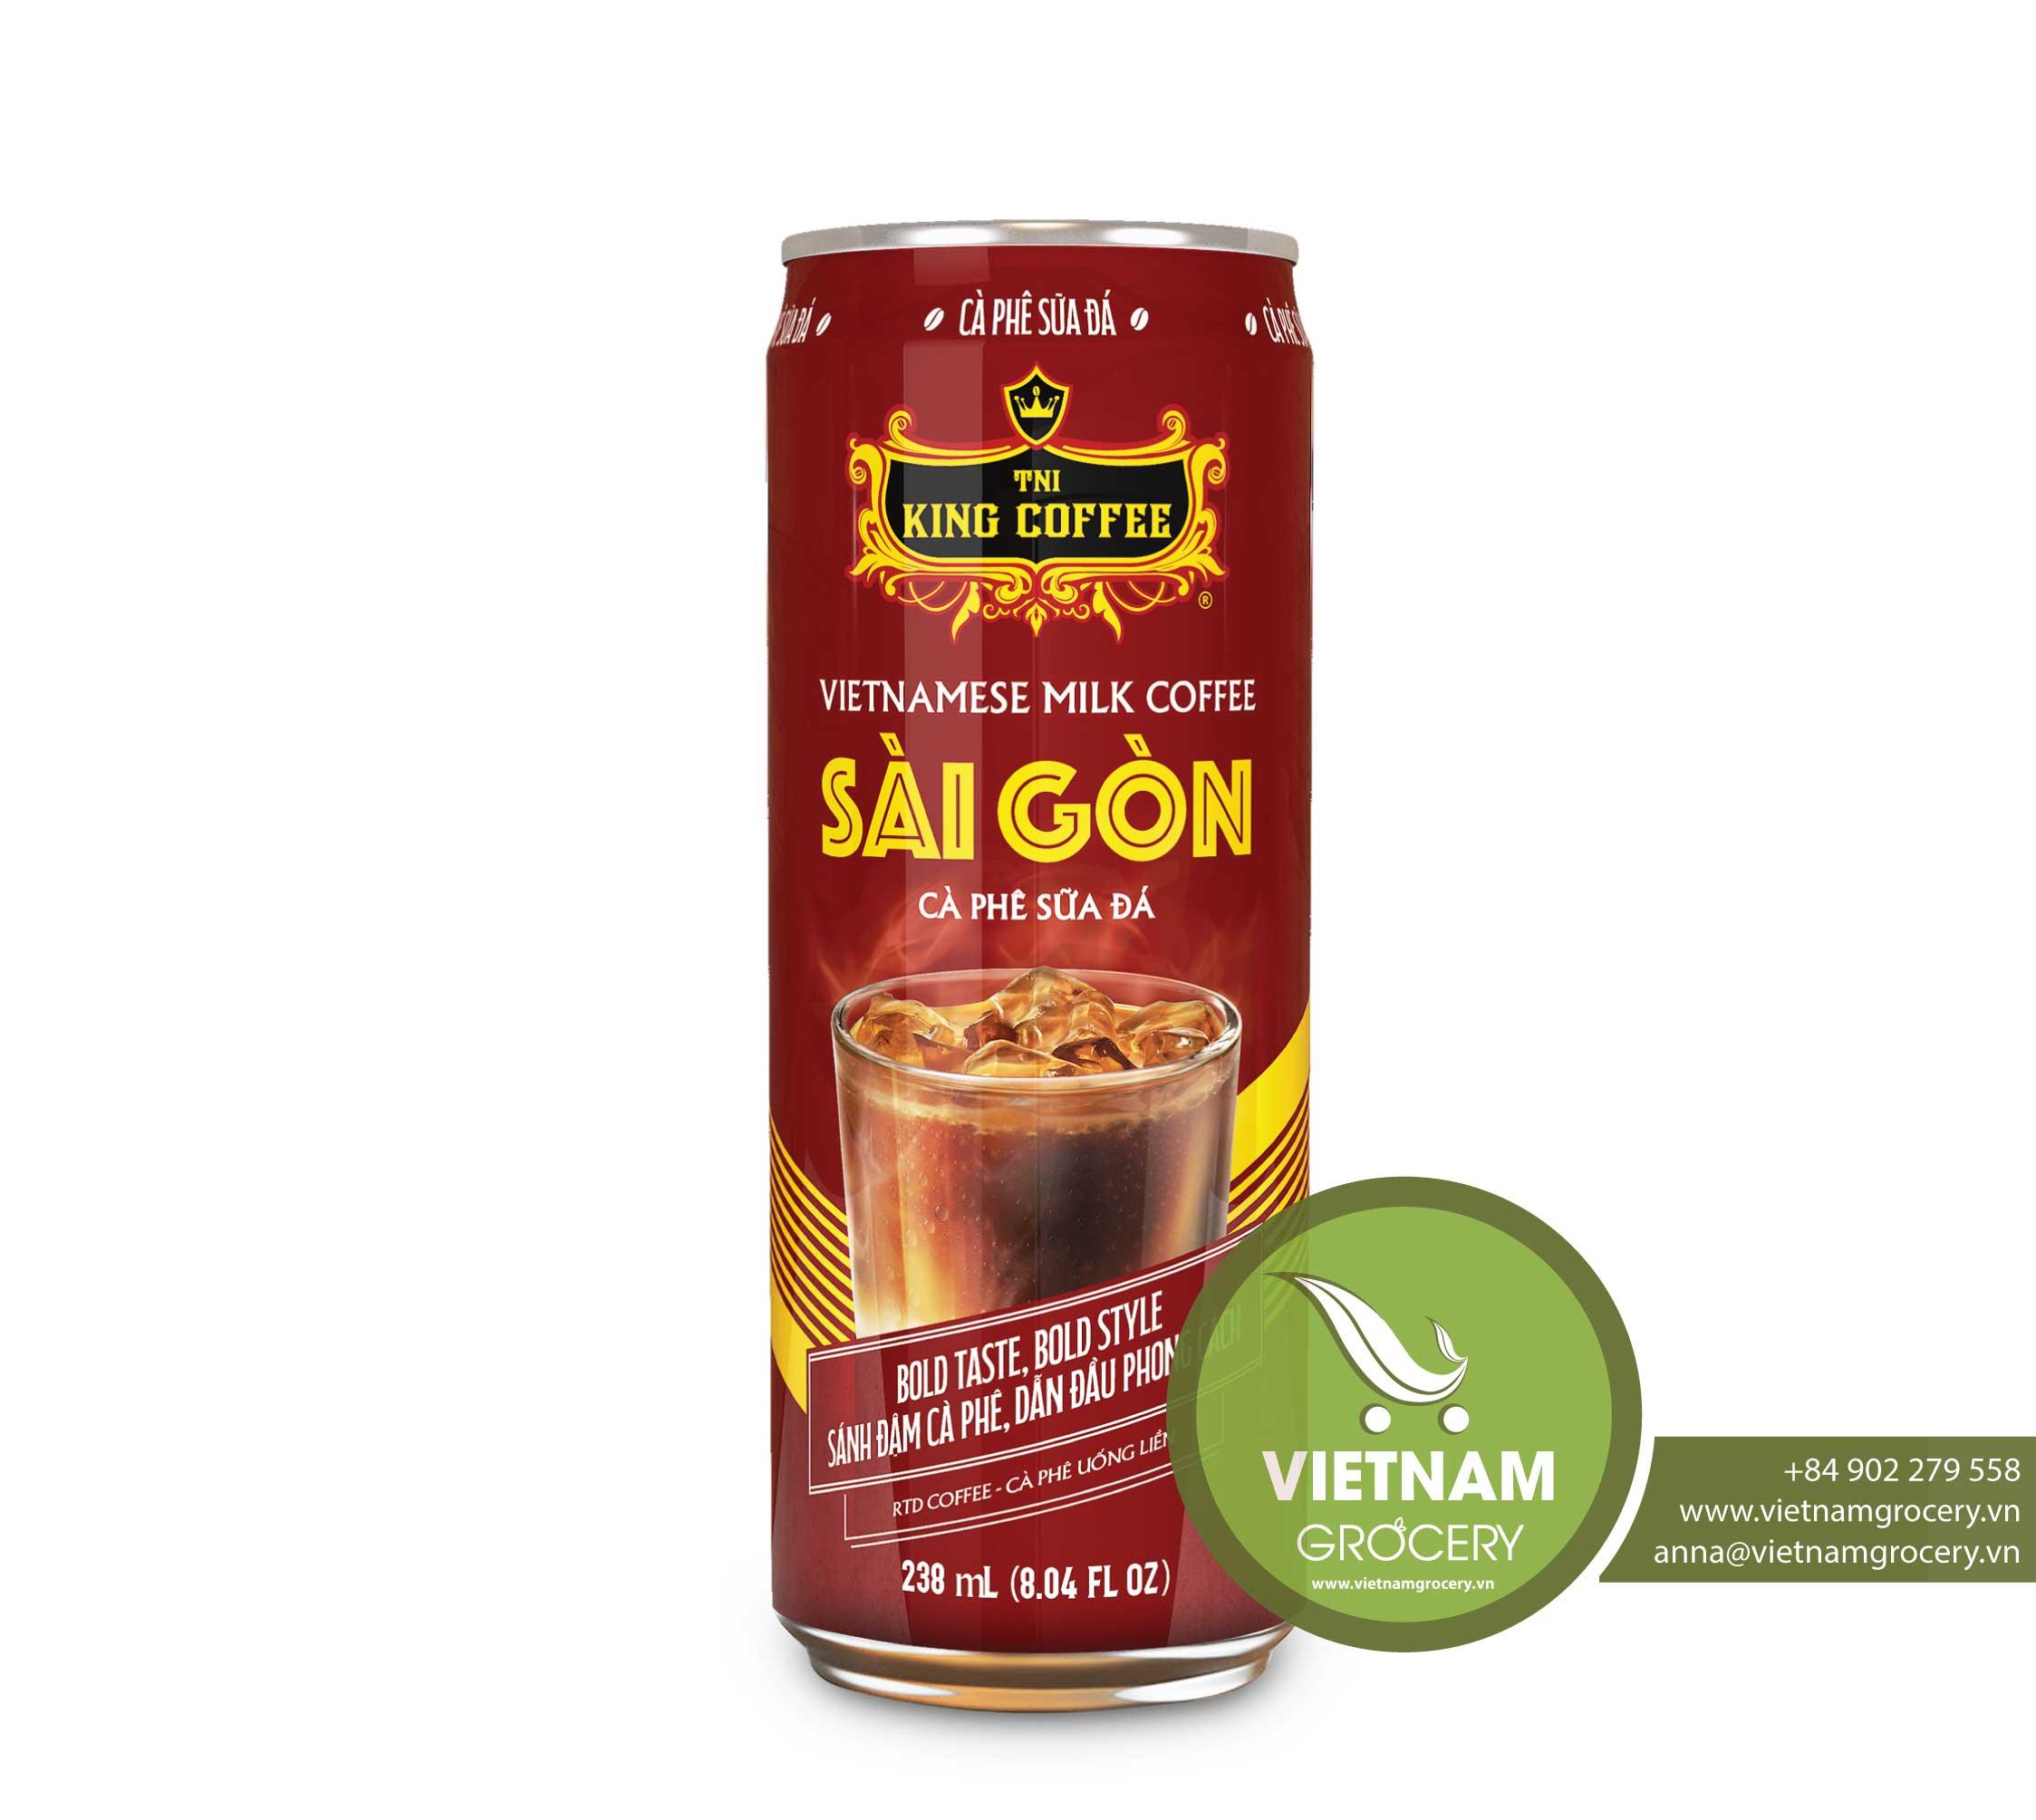 Saigon Iced Milk Coffee Instant Drink Wholesale